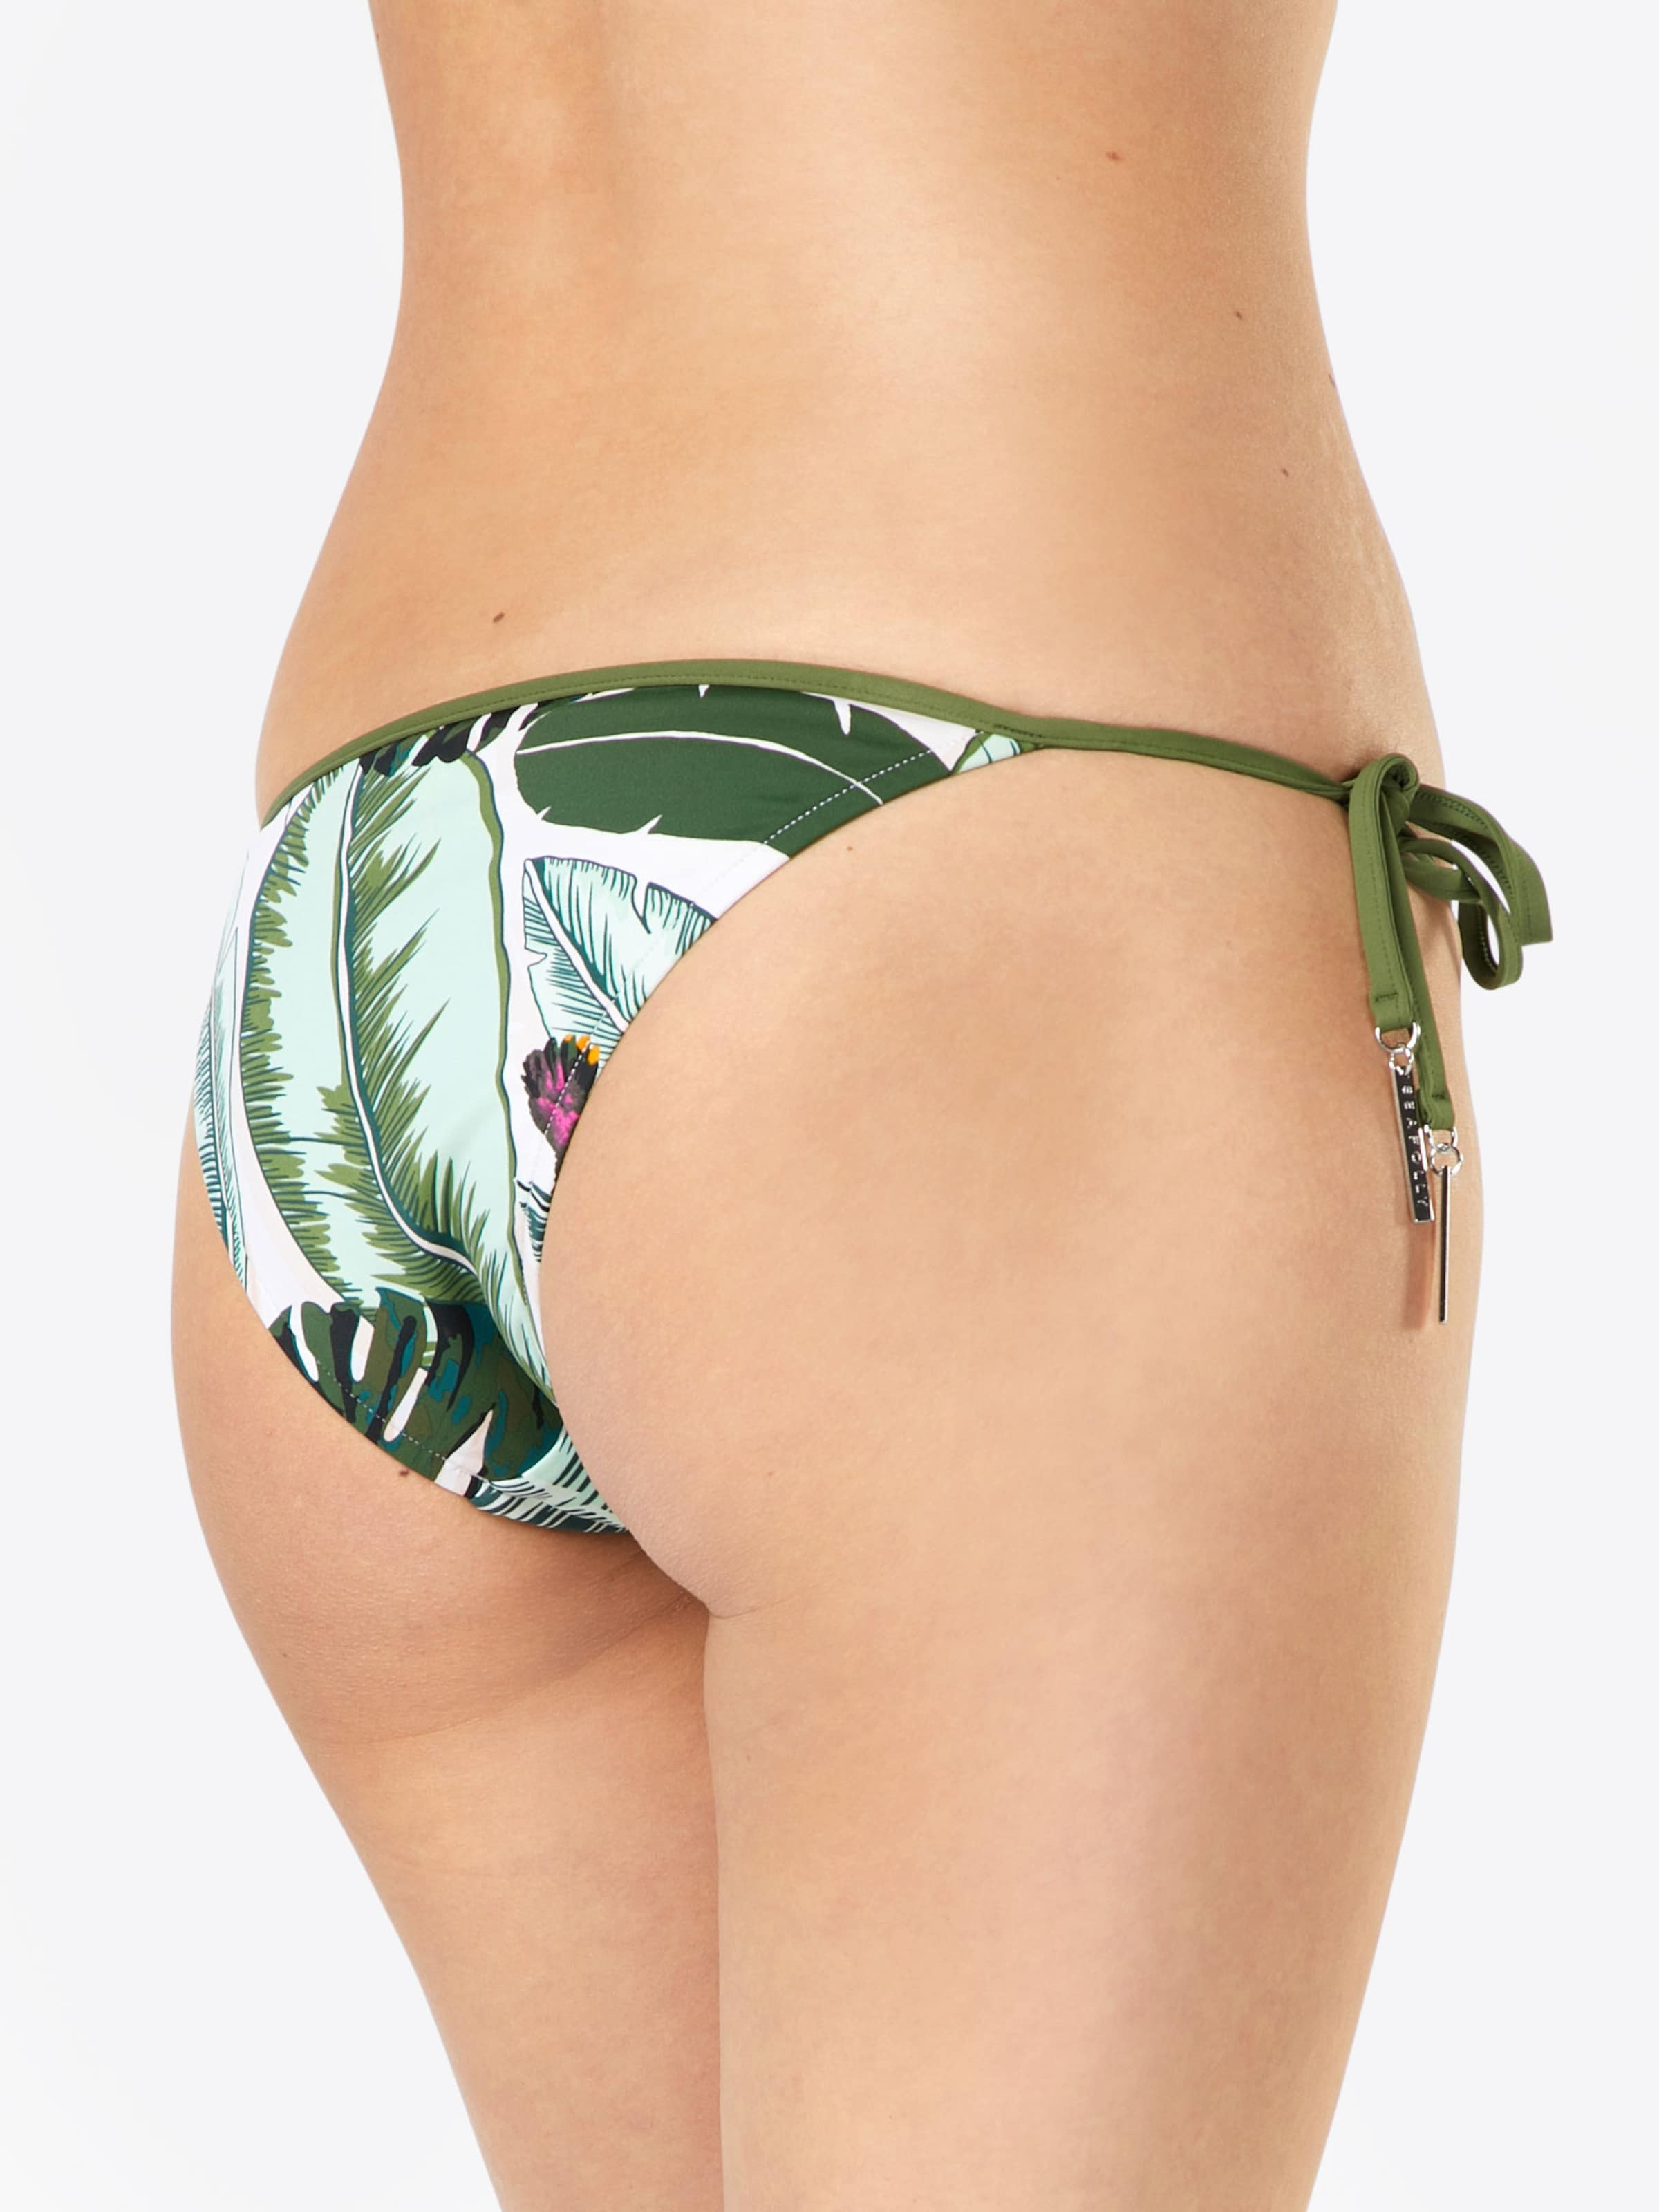 VertPomme Blanc En Bas De Seafolly 'brazilian' Bikini CQdtshr